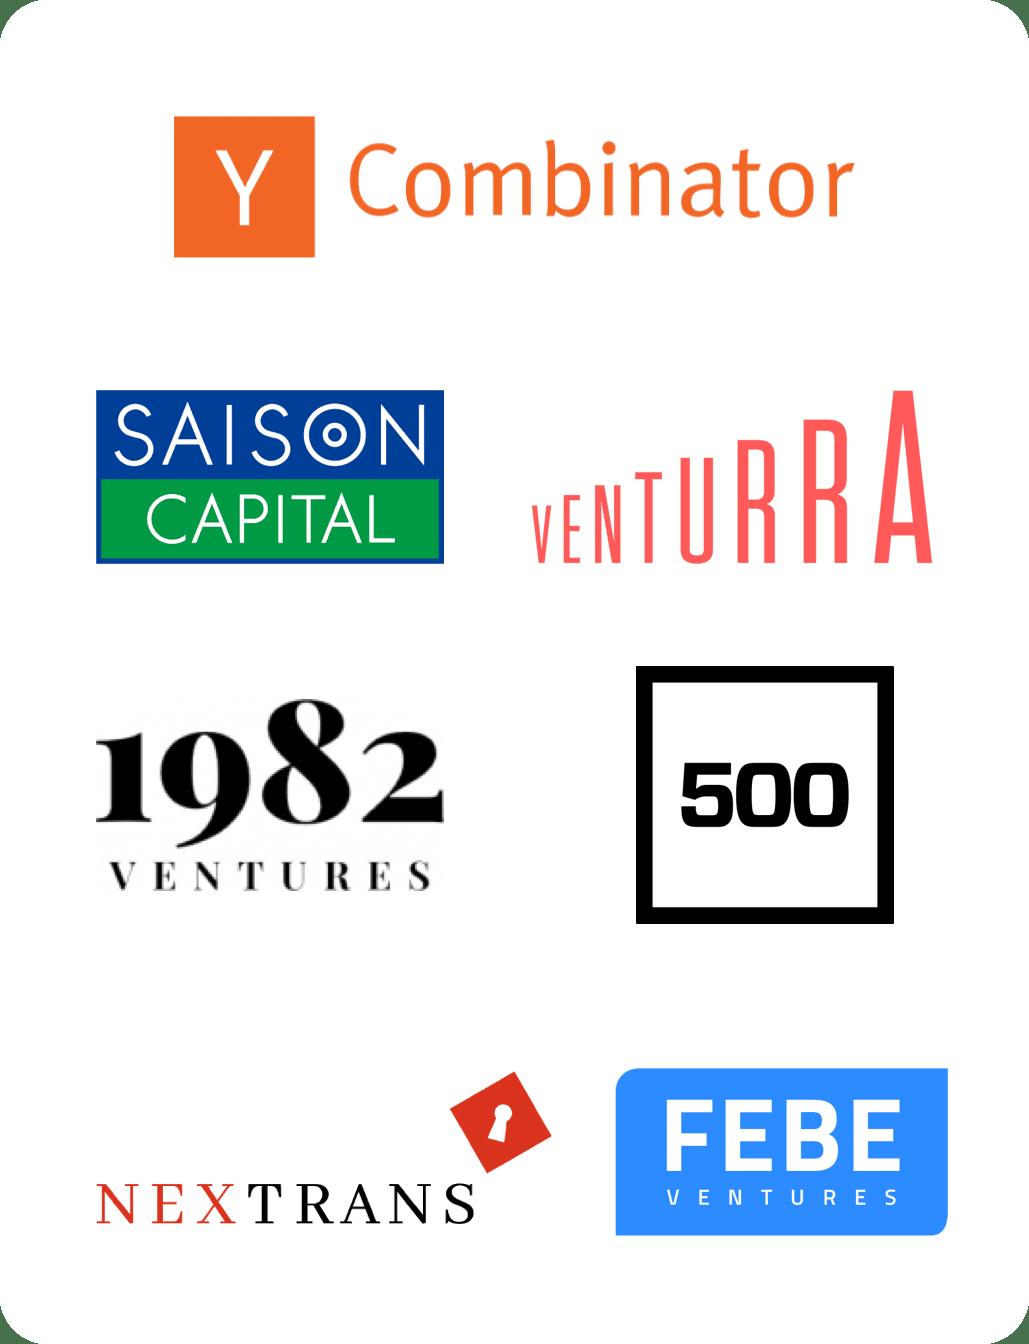 Our investors